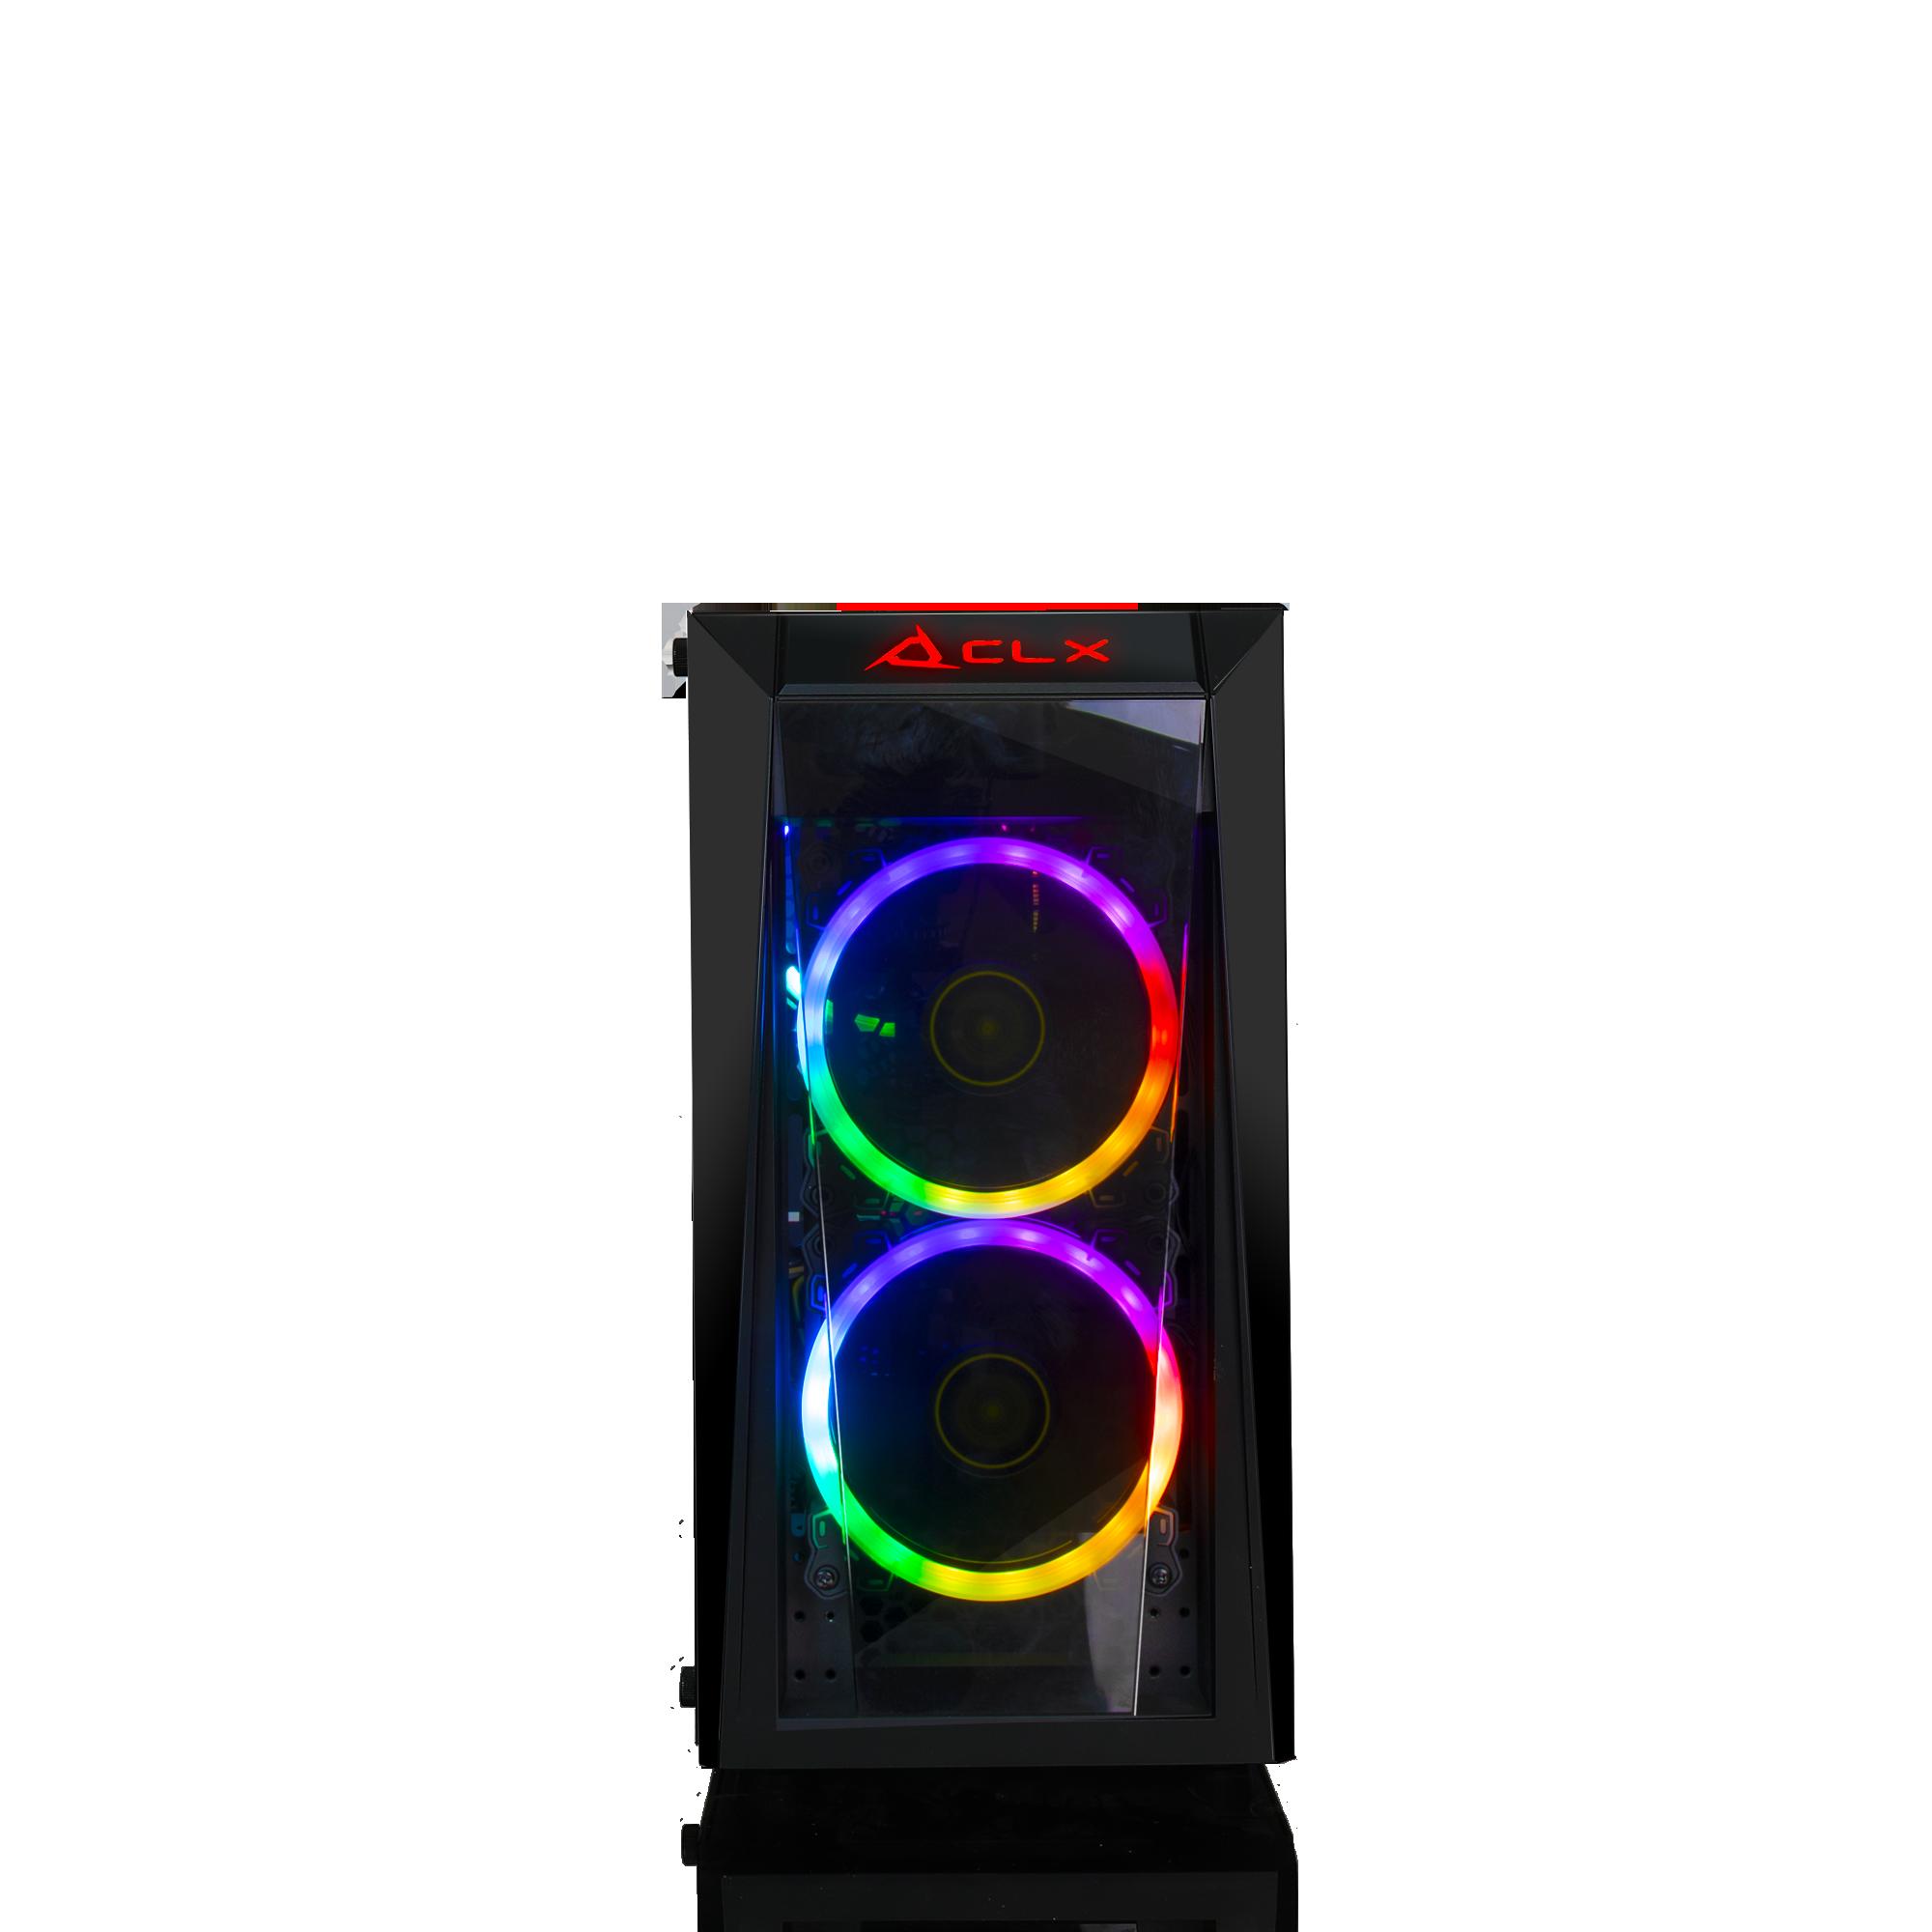 CLX Set E-SPorts: Gamidas Talos E1 Case, Ryzen 3 2300X, 8GB DDR4, 480GB SSD, RX 580 4GB, 500W PSU, WIn10H @ $589.99 + F/S